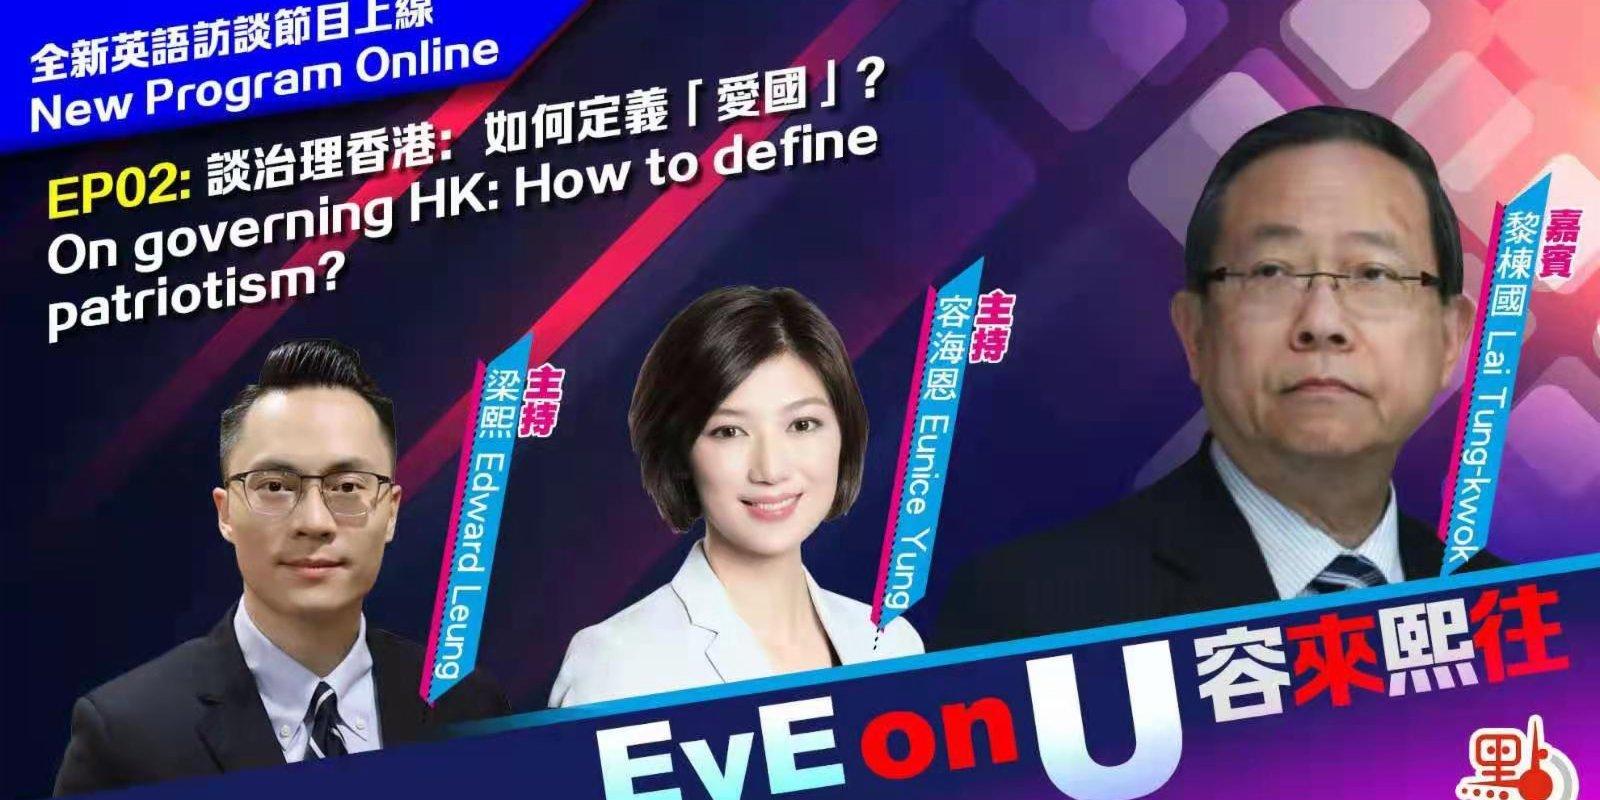 EyE on U | Lai Tung-kwok on governing HK: How to define patriotism?